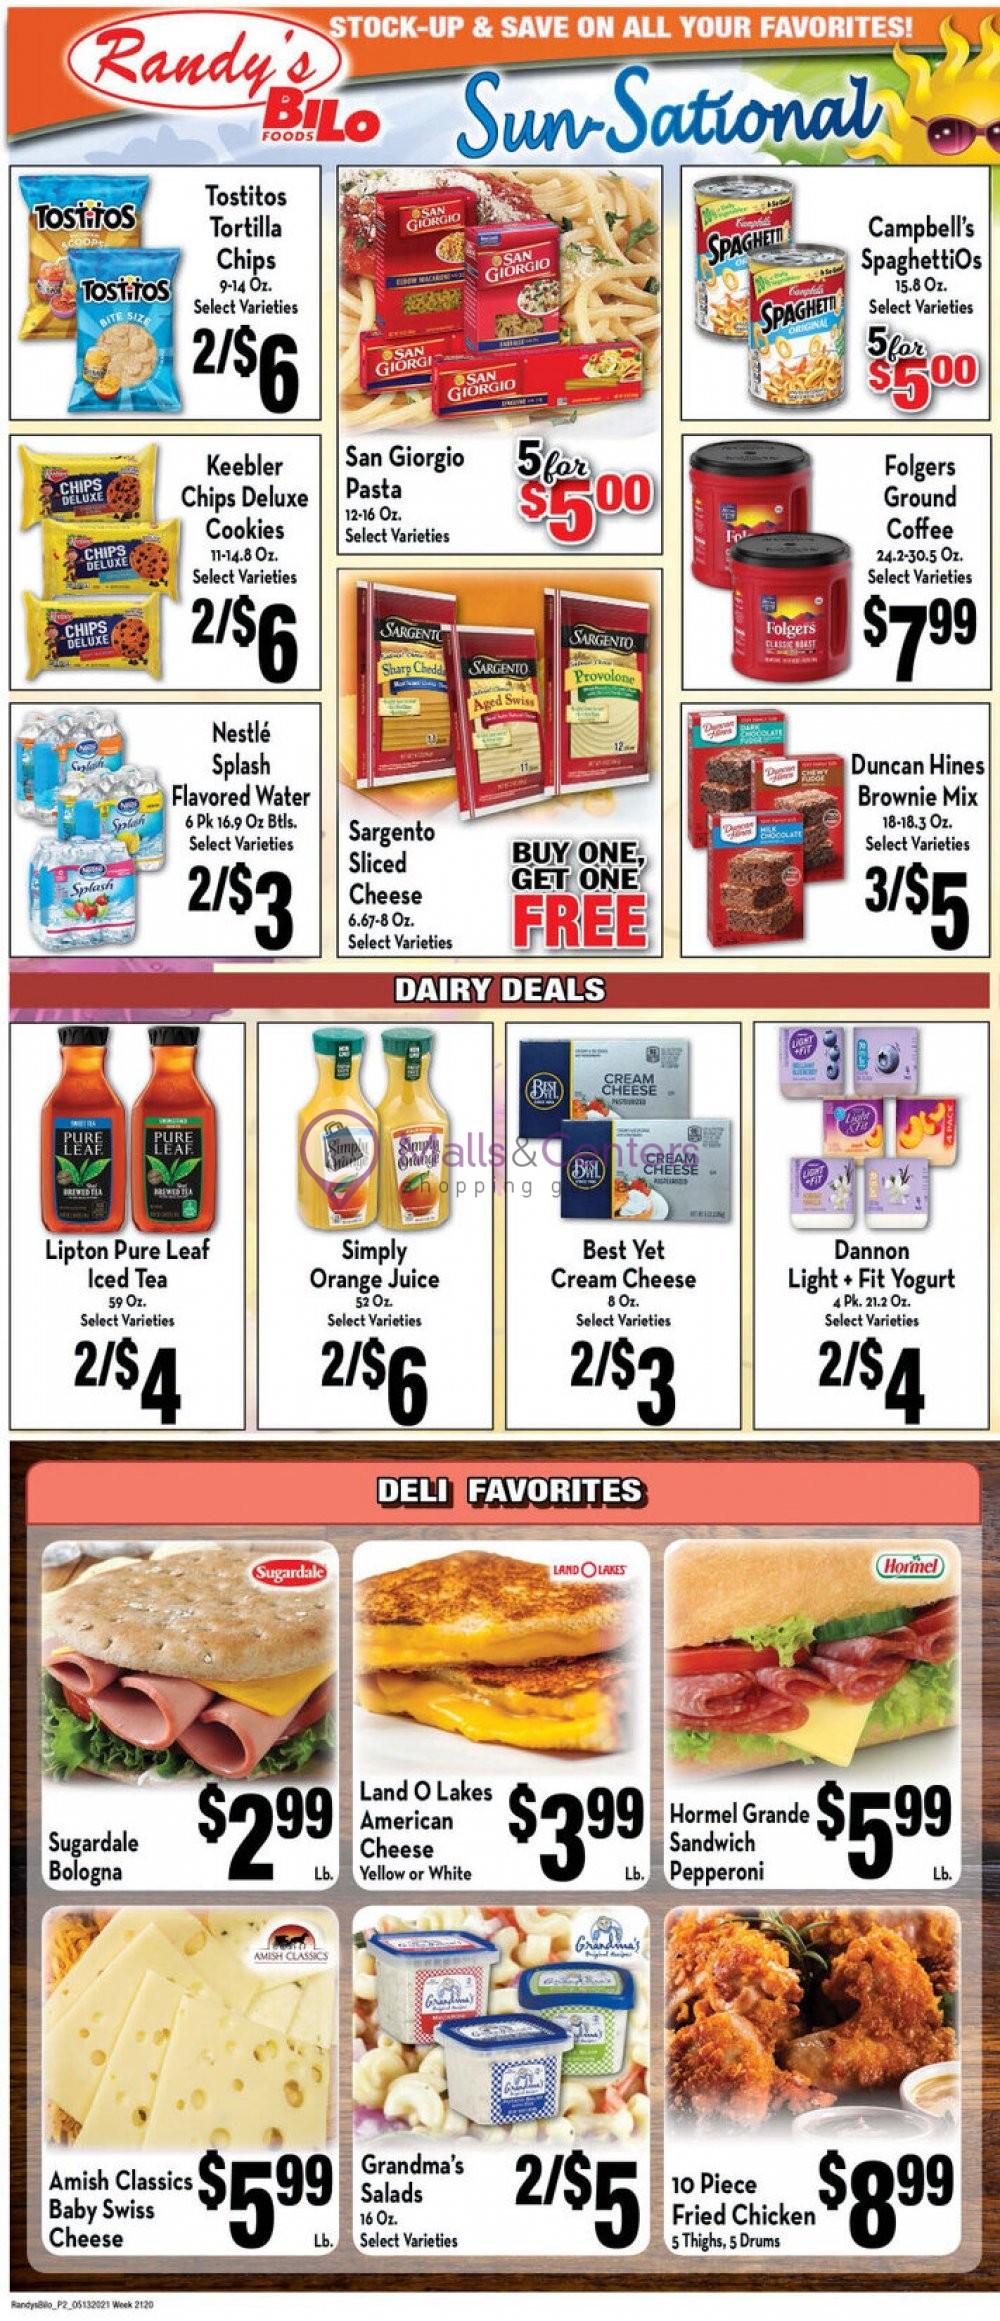 weekly ads Randy's BiLo Foods - page 1 - mallscenters.com